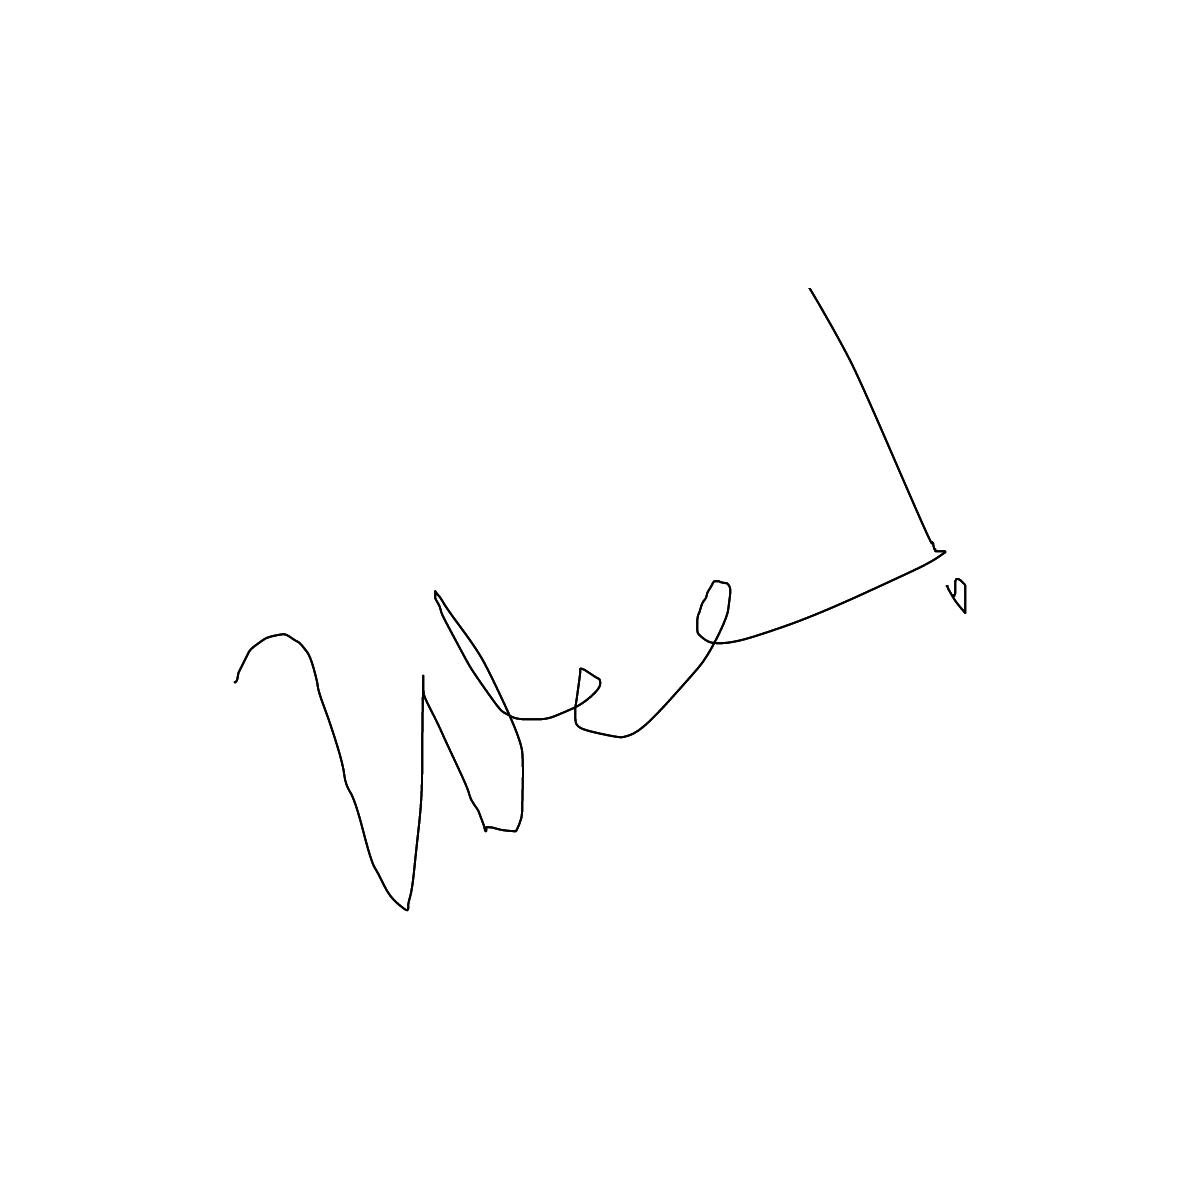 BAAAM drawing#6489 lat:45.4799537658691400lng: -73.6181106567382800